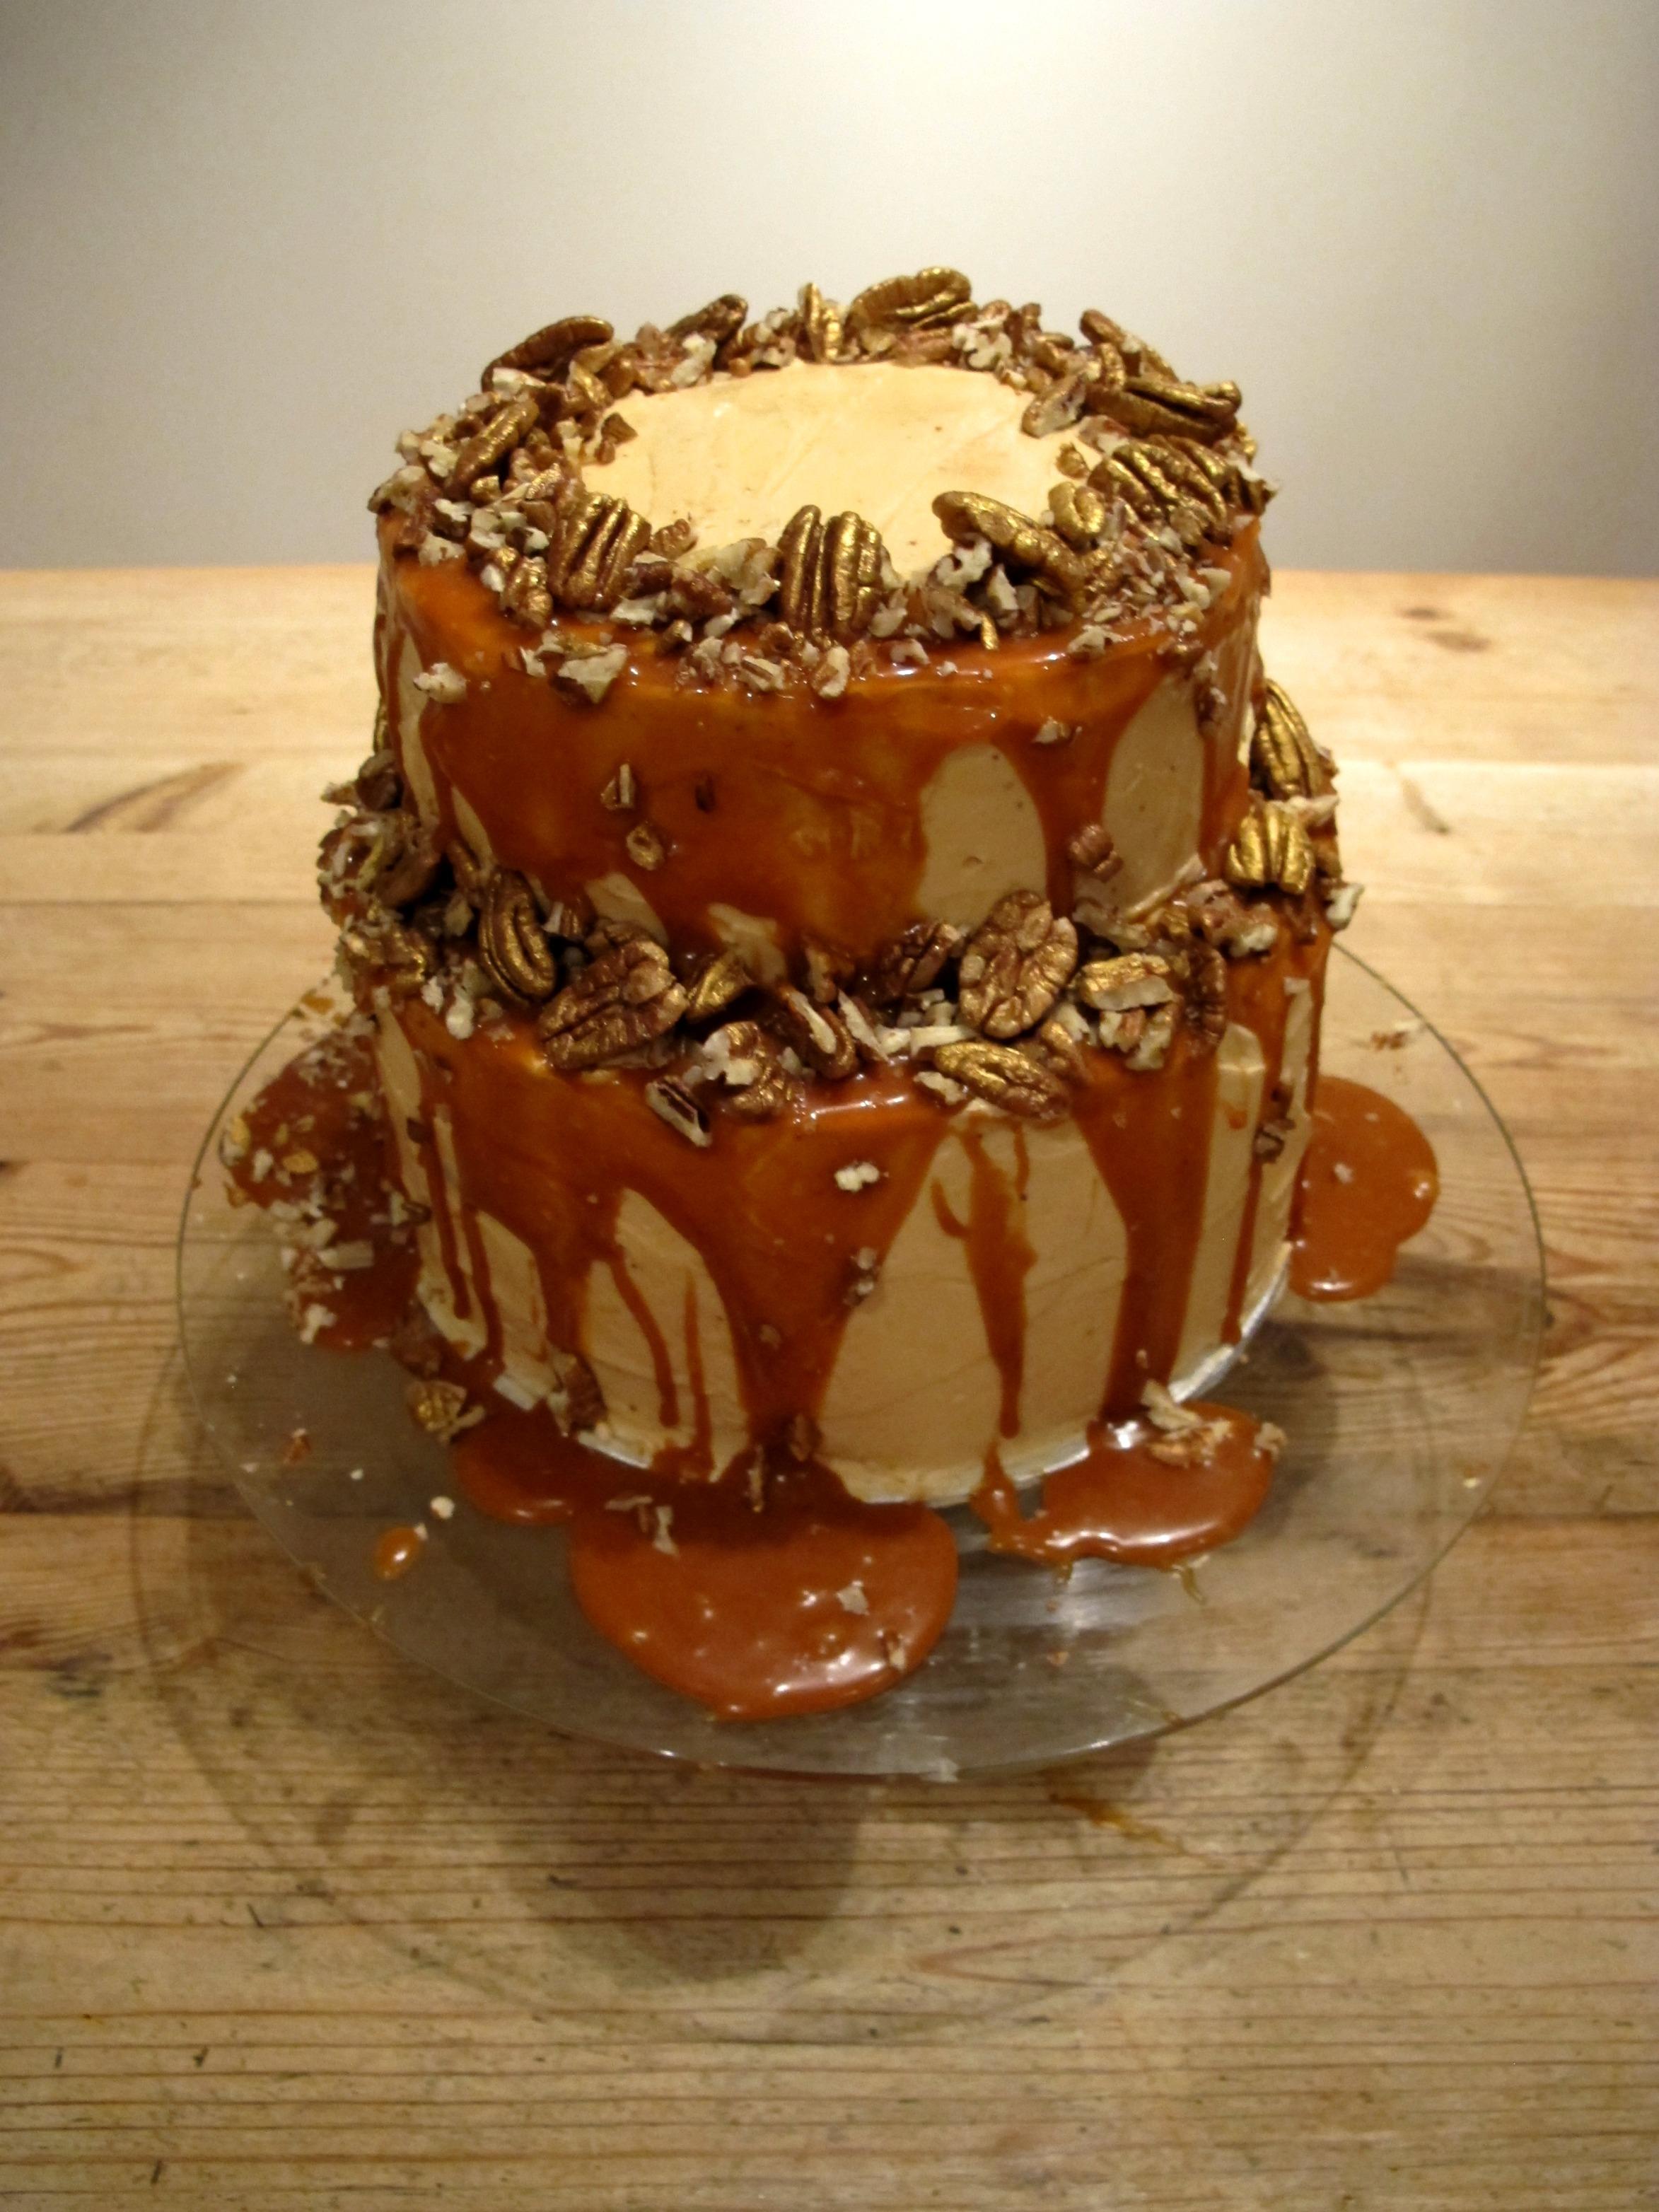 Salted Caramel, Golden Pecan and Chocolate Celebration Cake